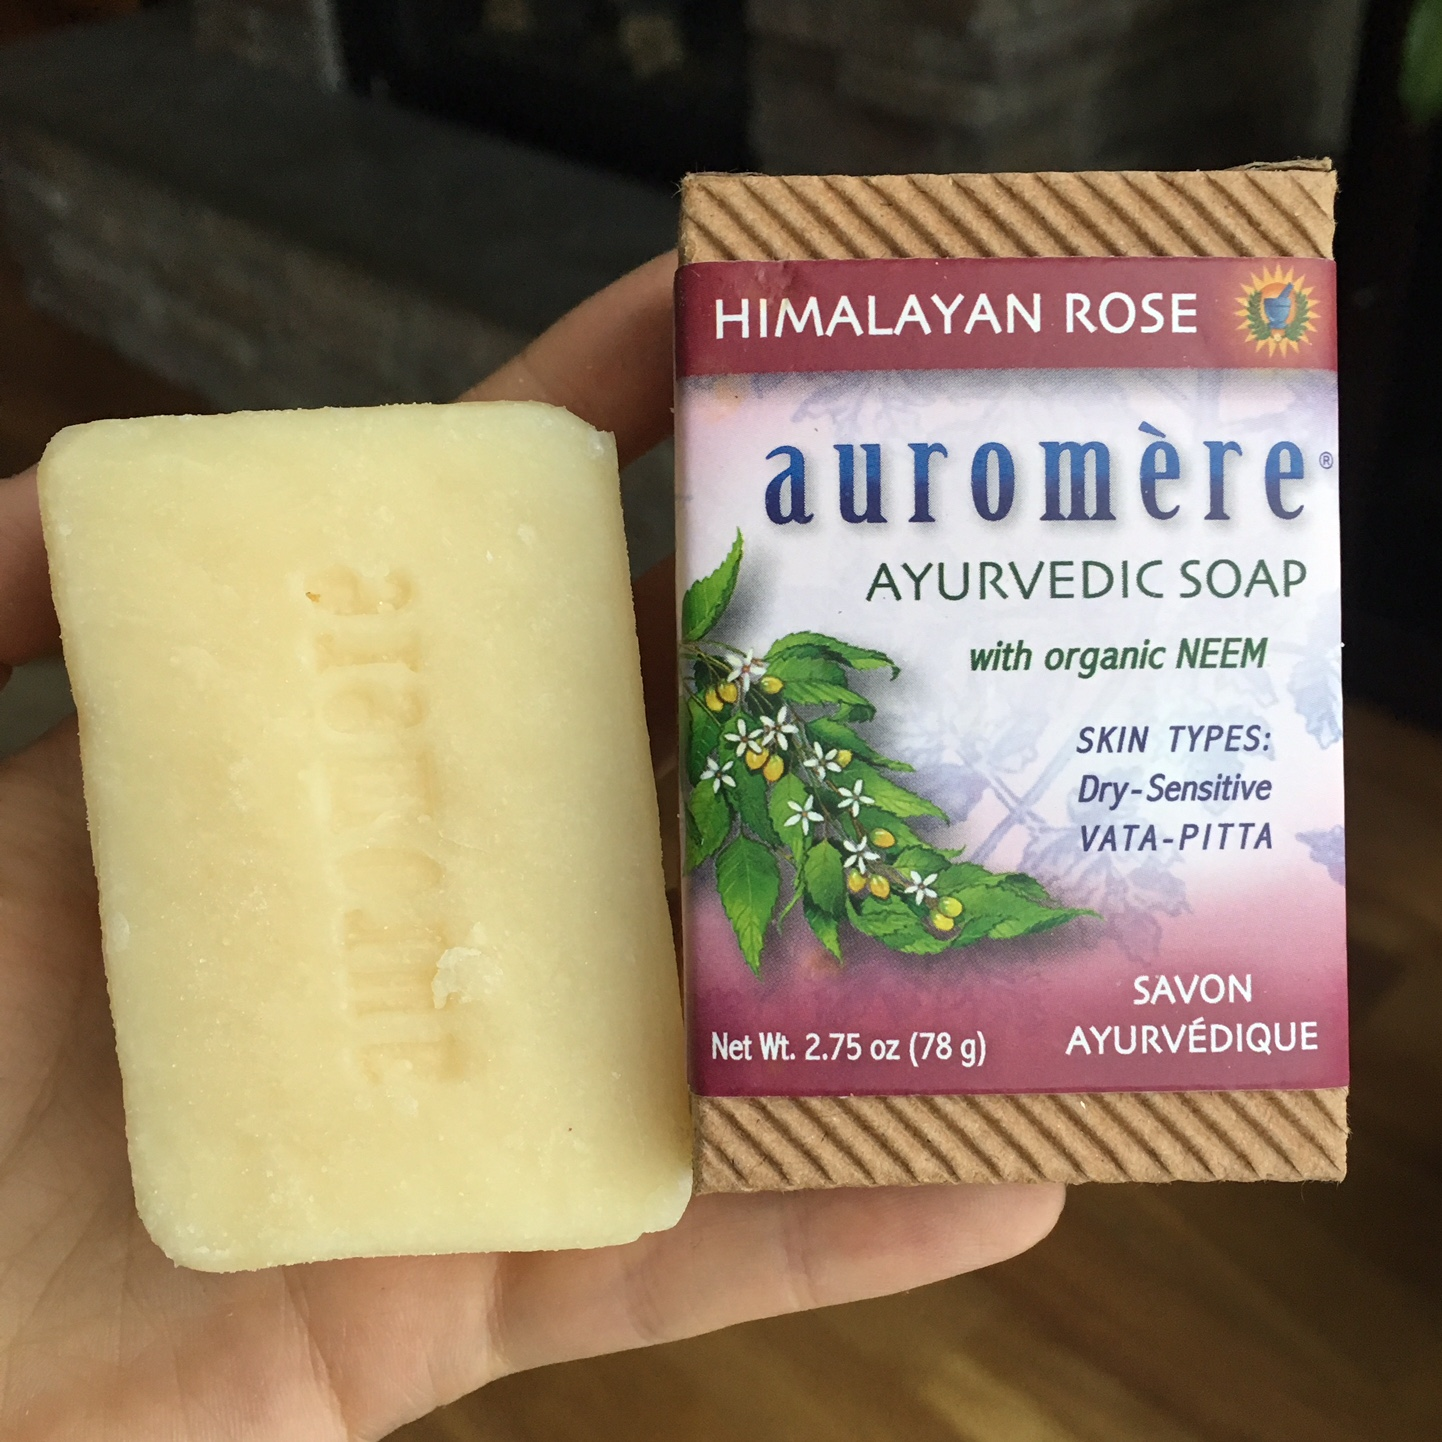 auromere-himalayan-rose-ayurvedic-soap